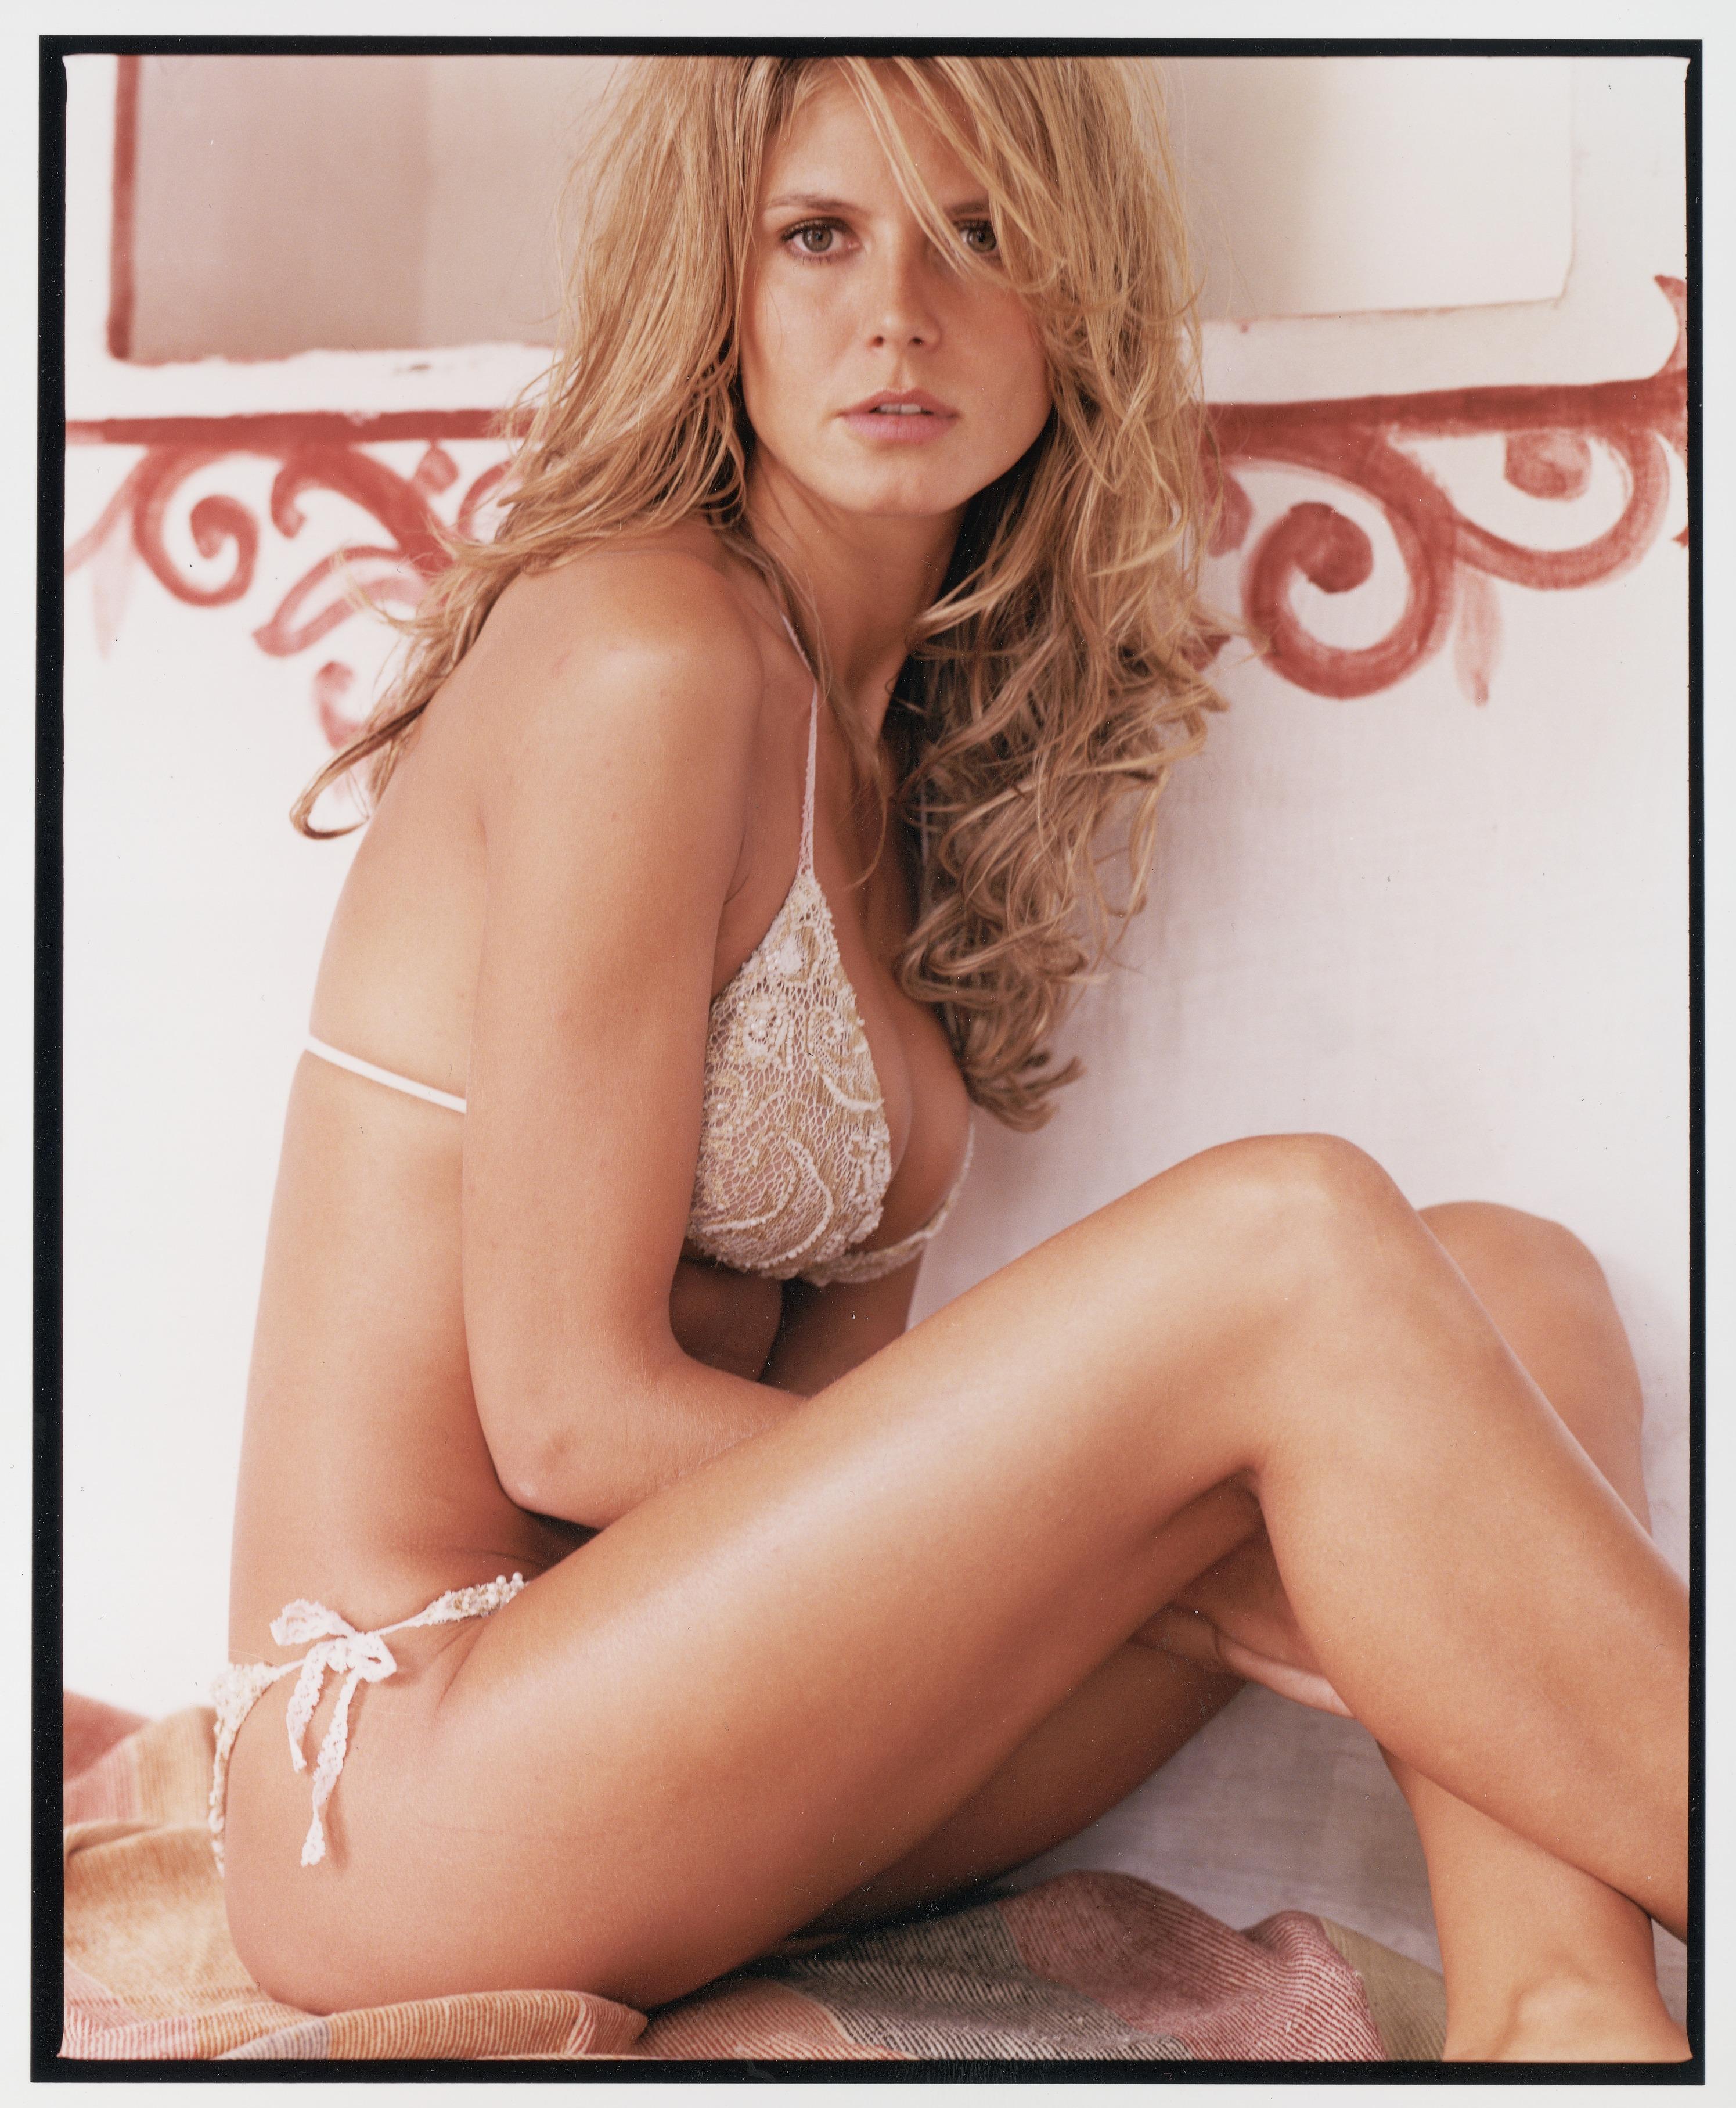 Heidi as purveyor of the polished bed-head look :: Stewart Shining/SI